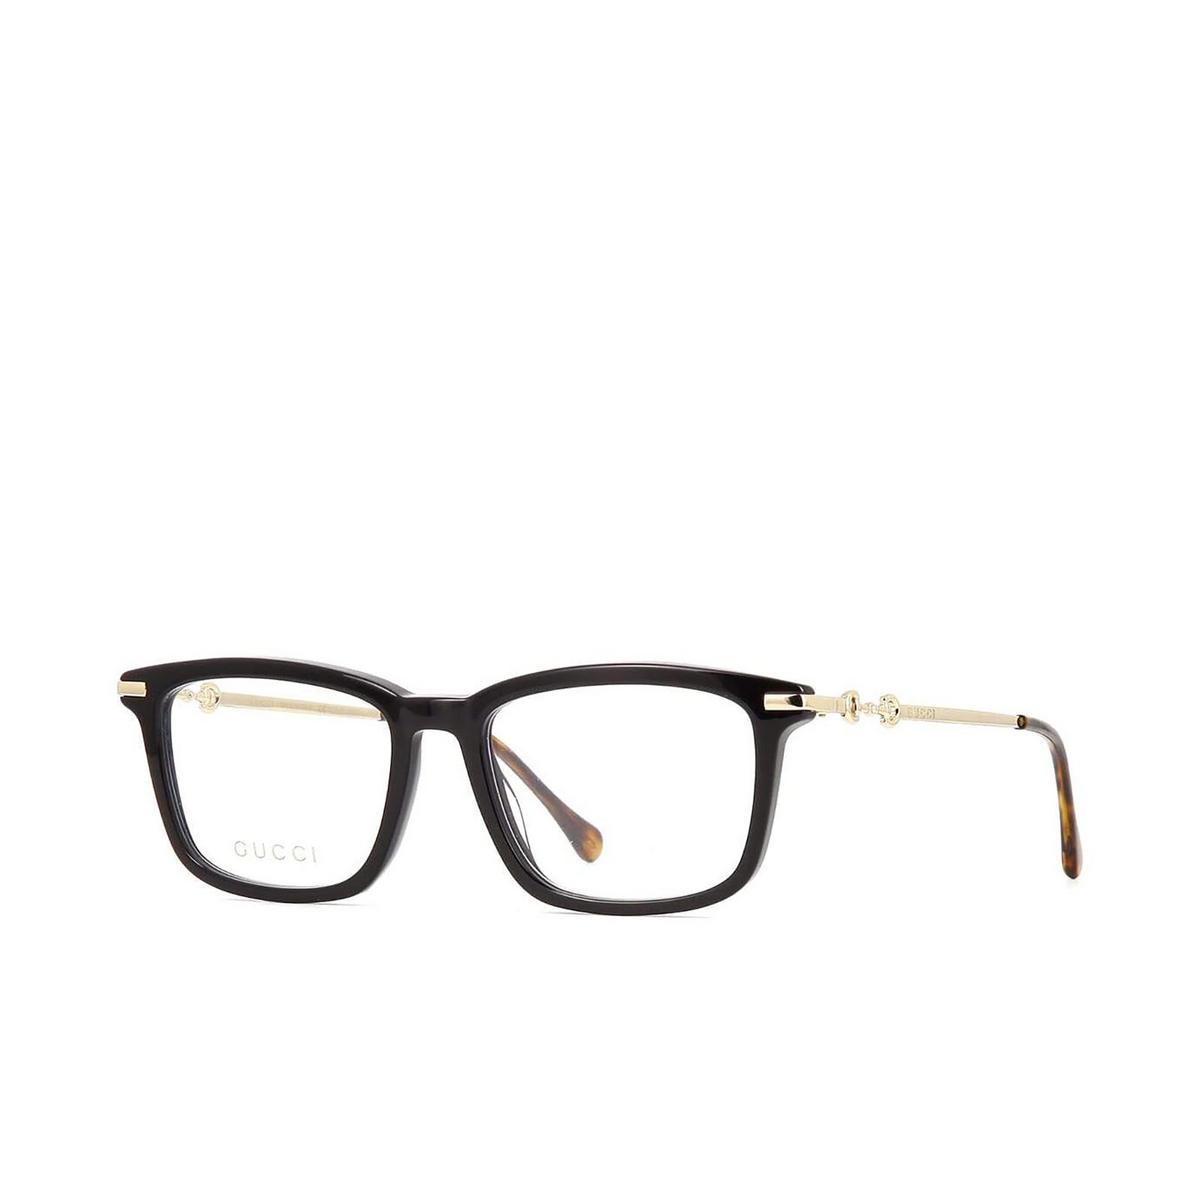 Gucci® Rectangle Eyeglasses: GG0920O color Black 001 - three-quarters view.